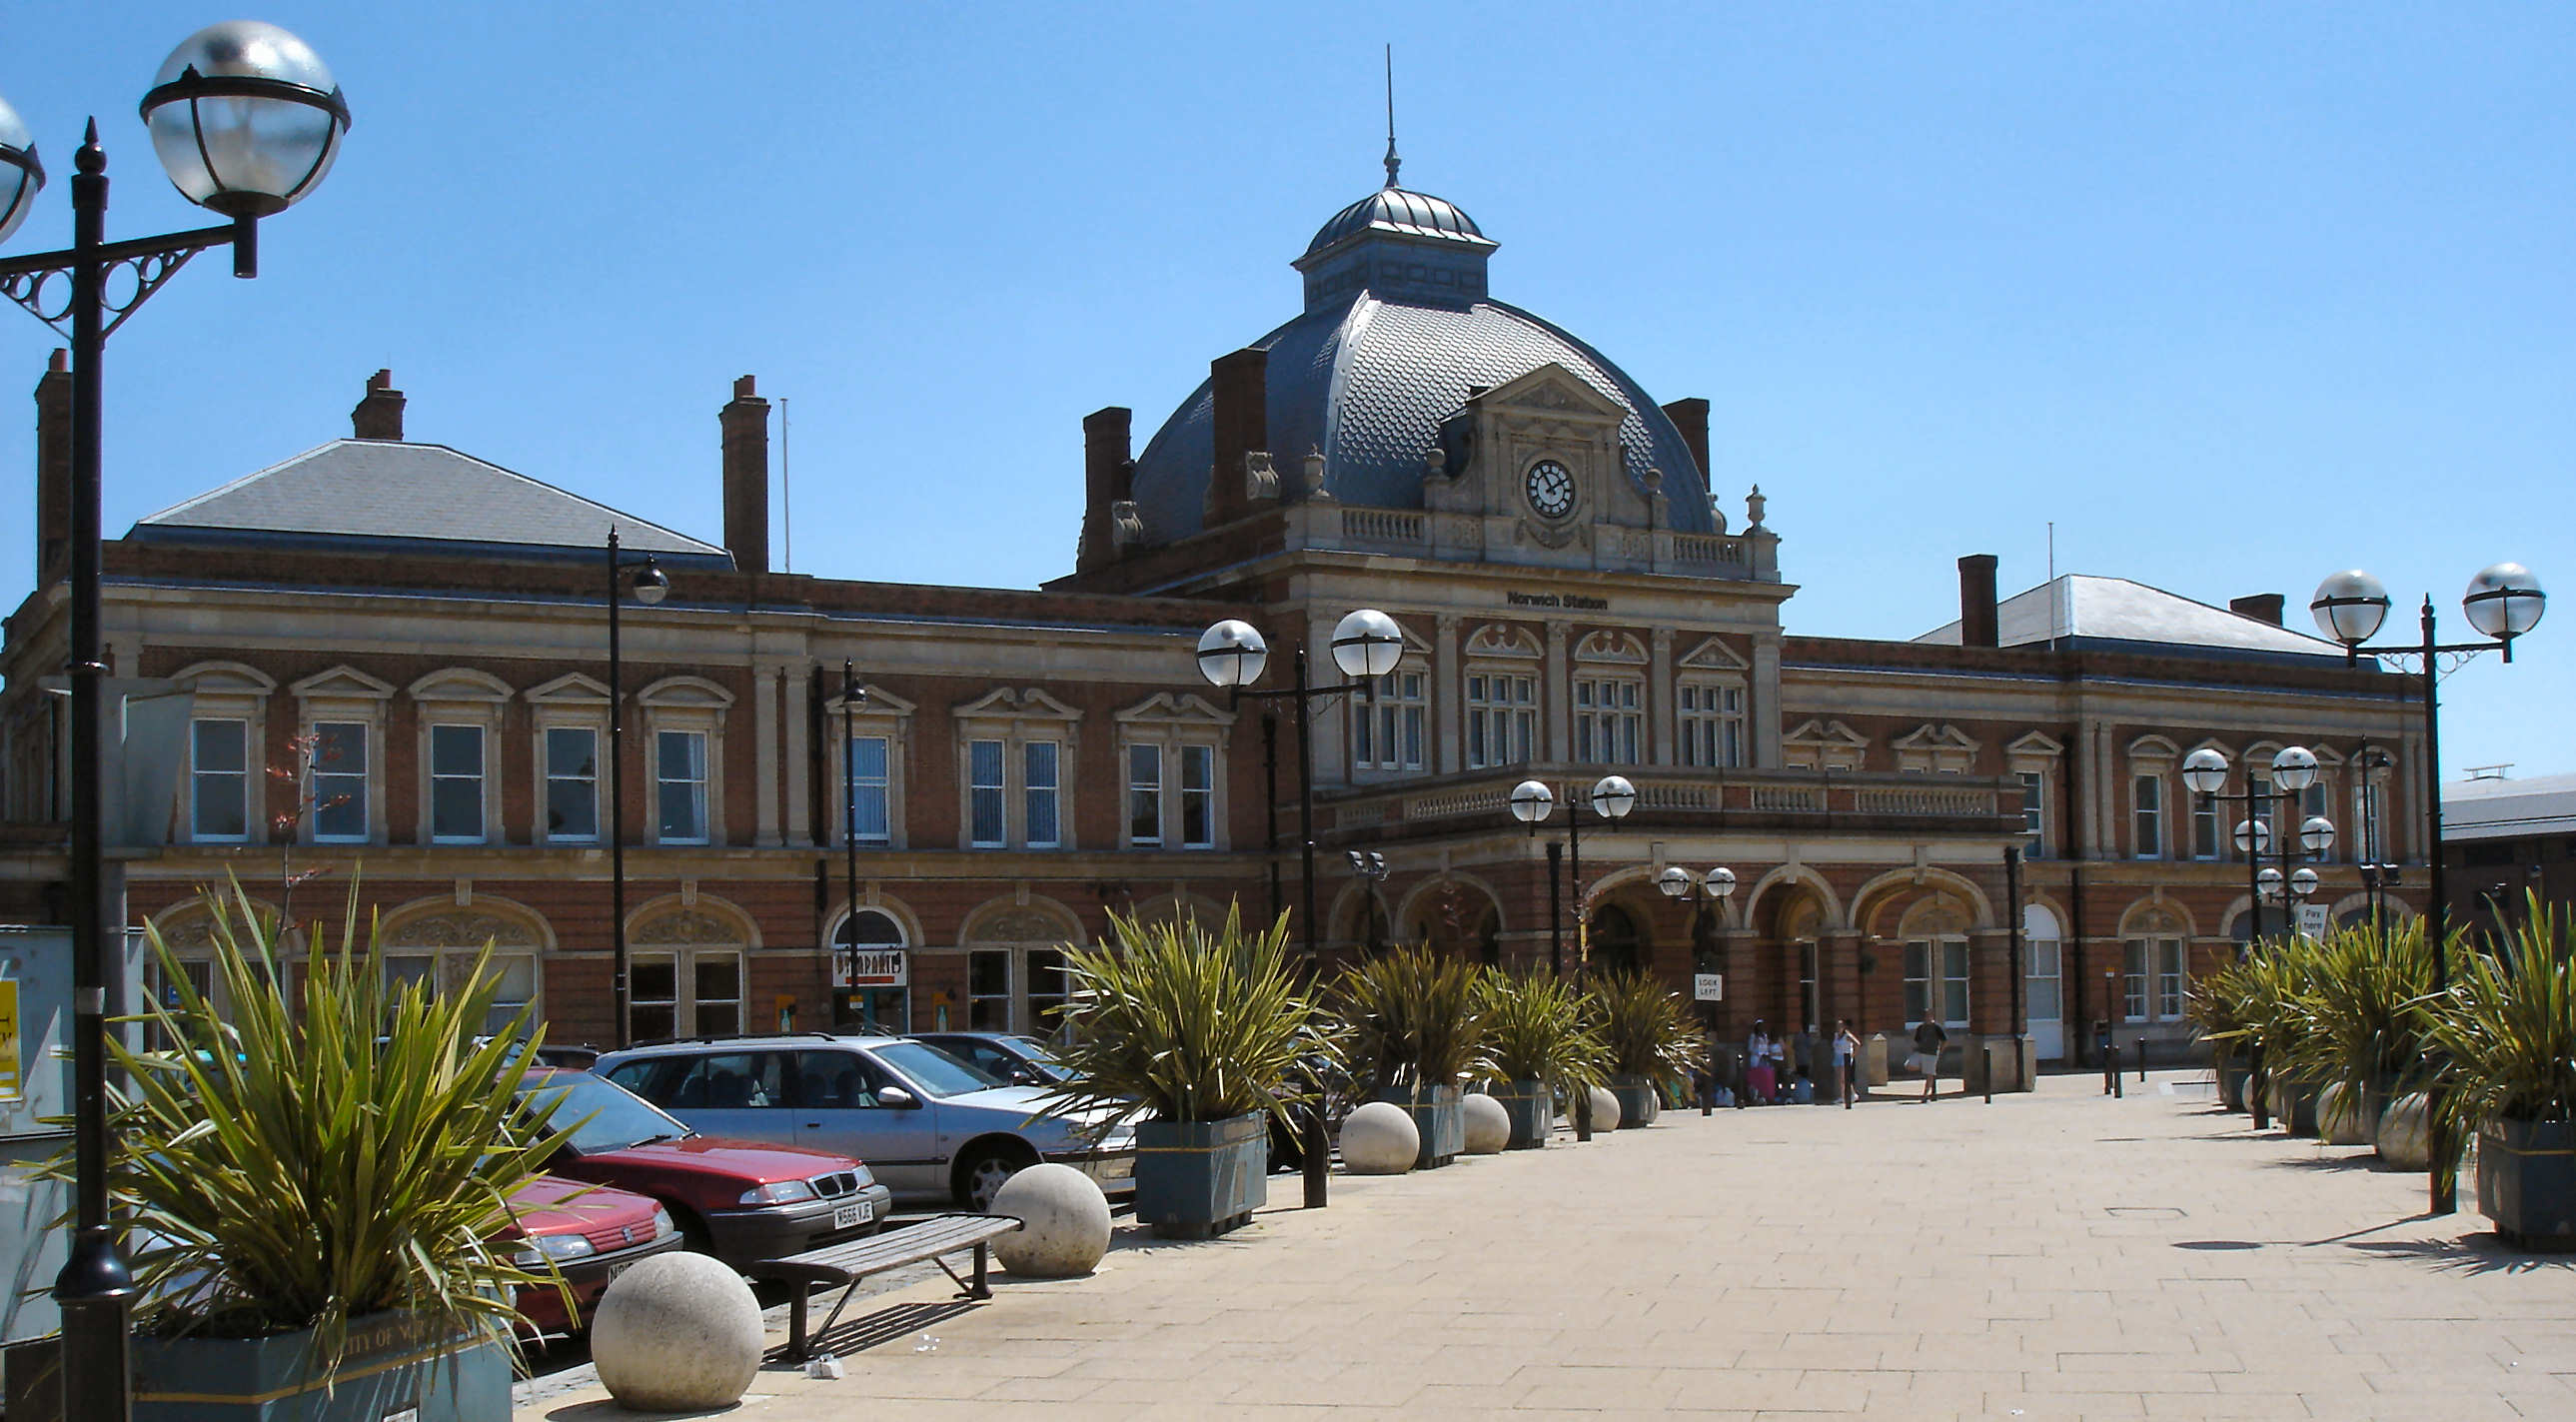 File:Norwich UK train station.JPG - Wikimedia Commons